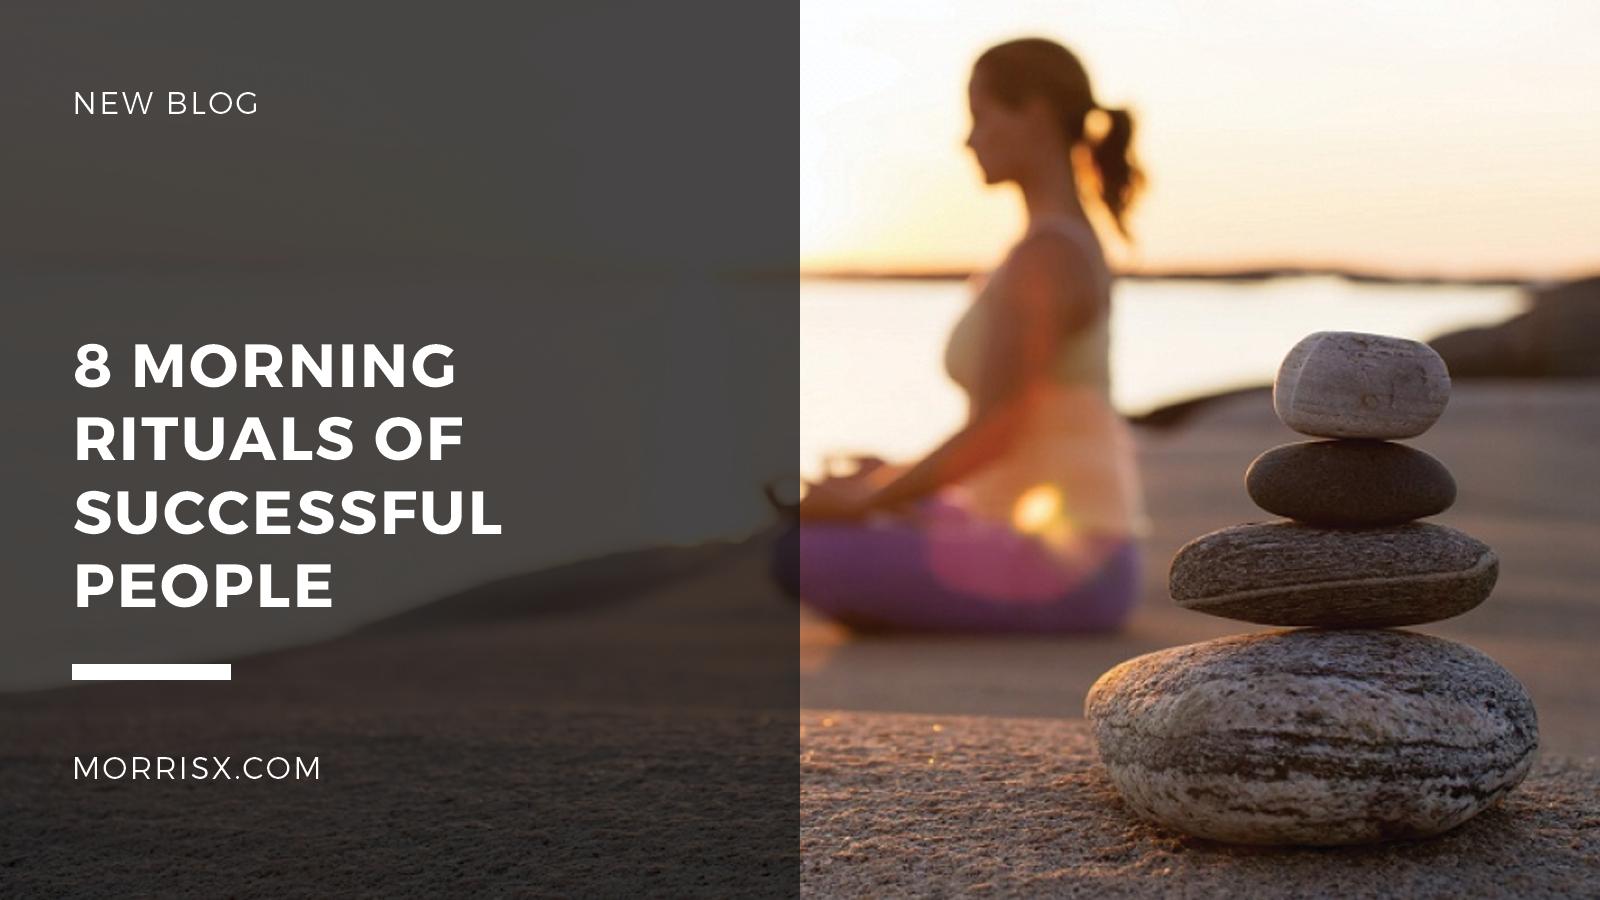 8 Morning Rituals Of Successful People